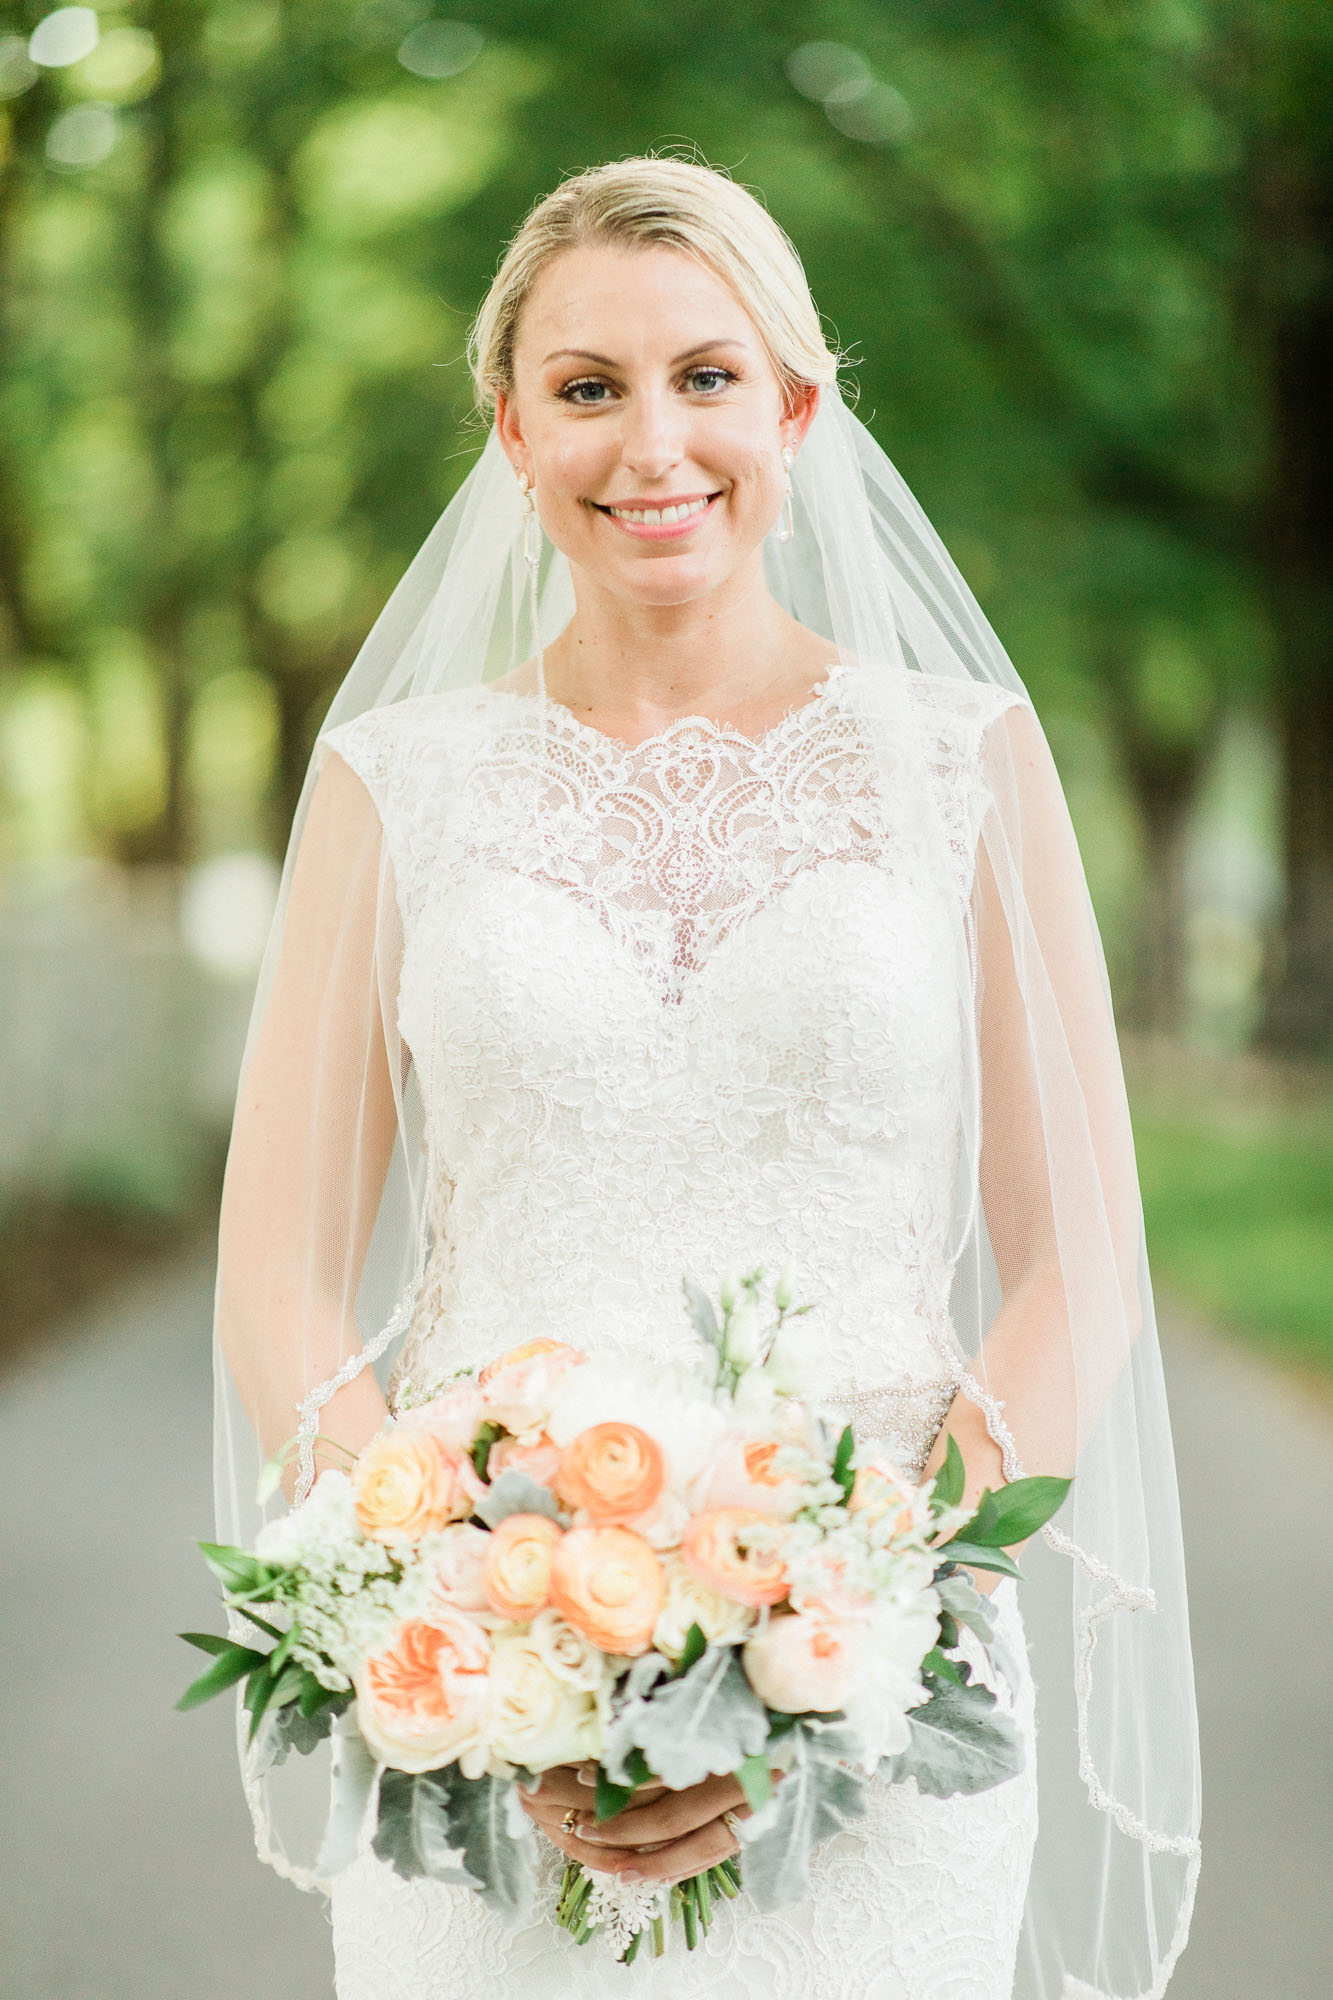 Allenberry-resort-historic-pennsylvania-wedding-22291.jpg